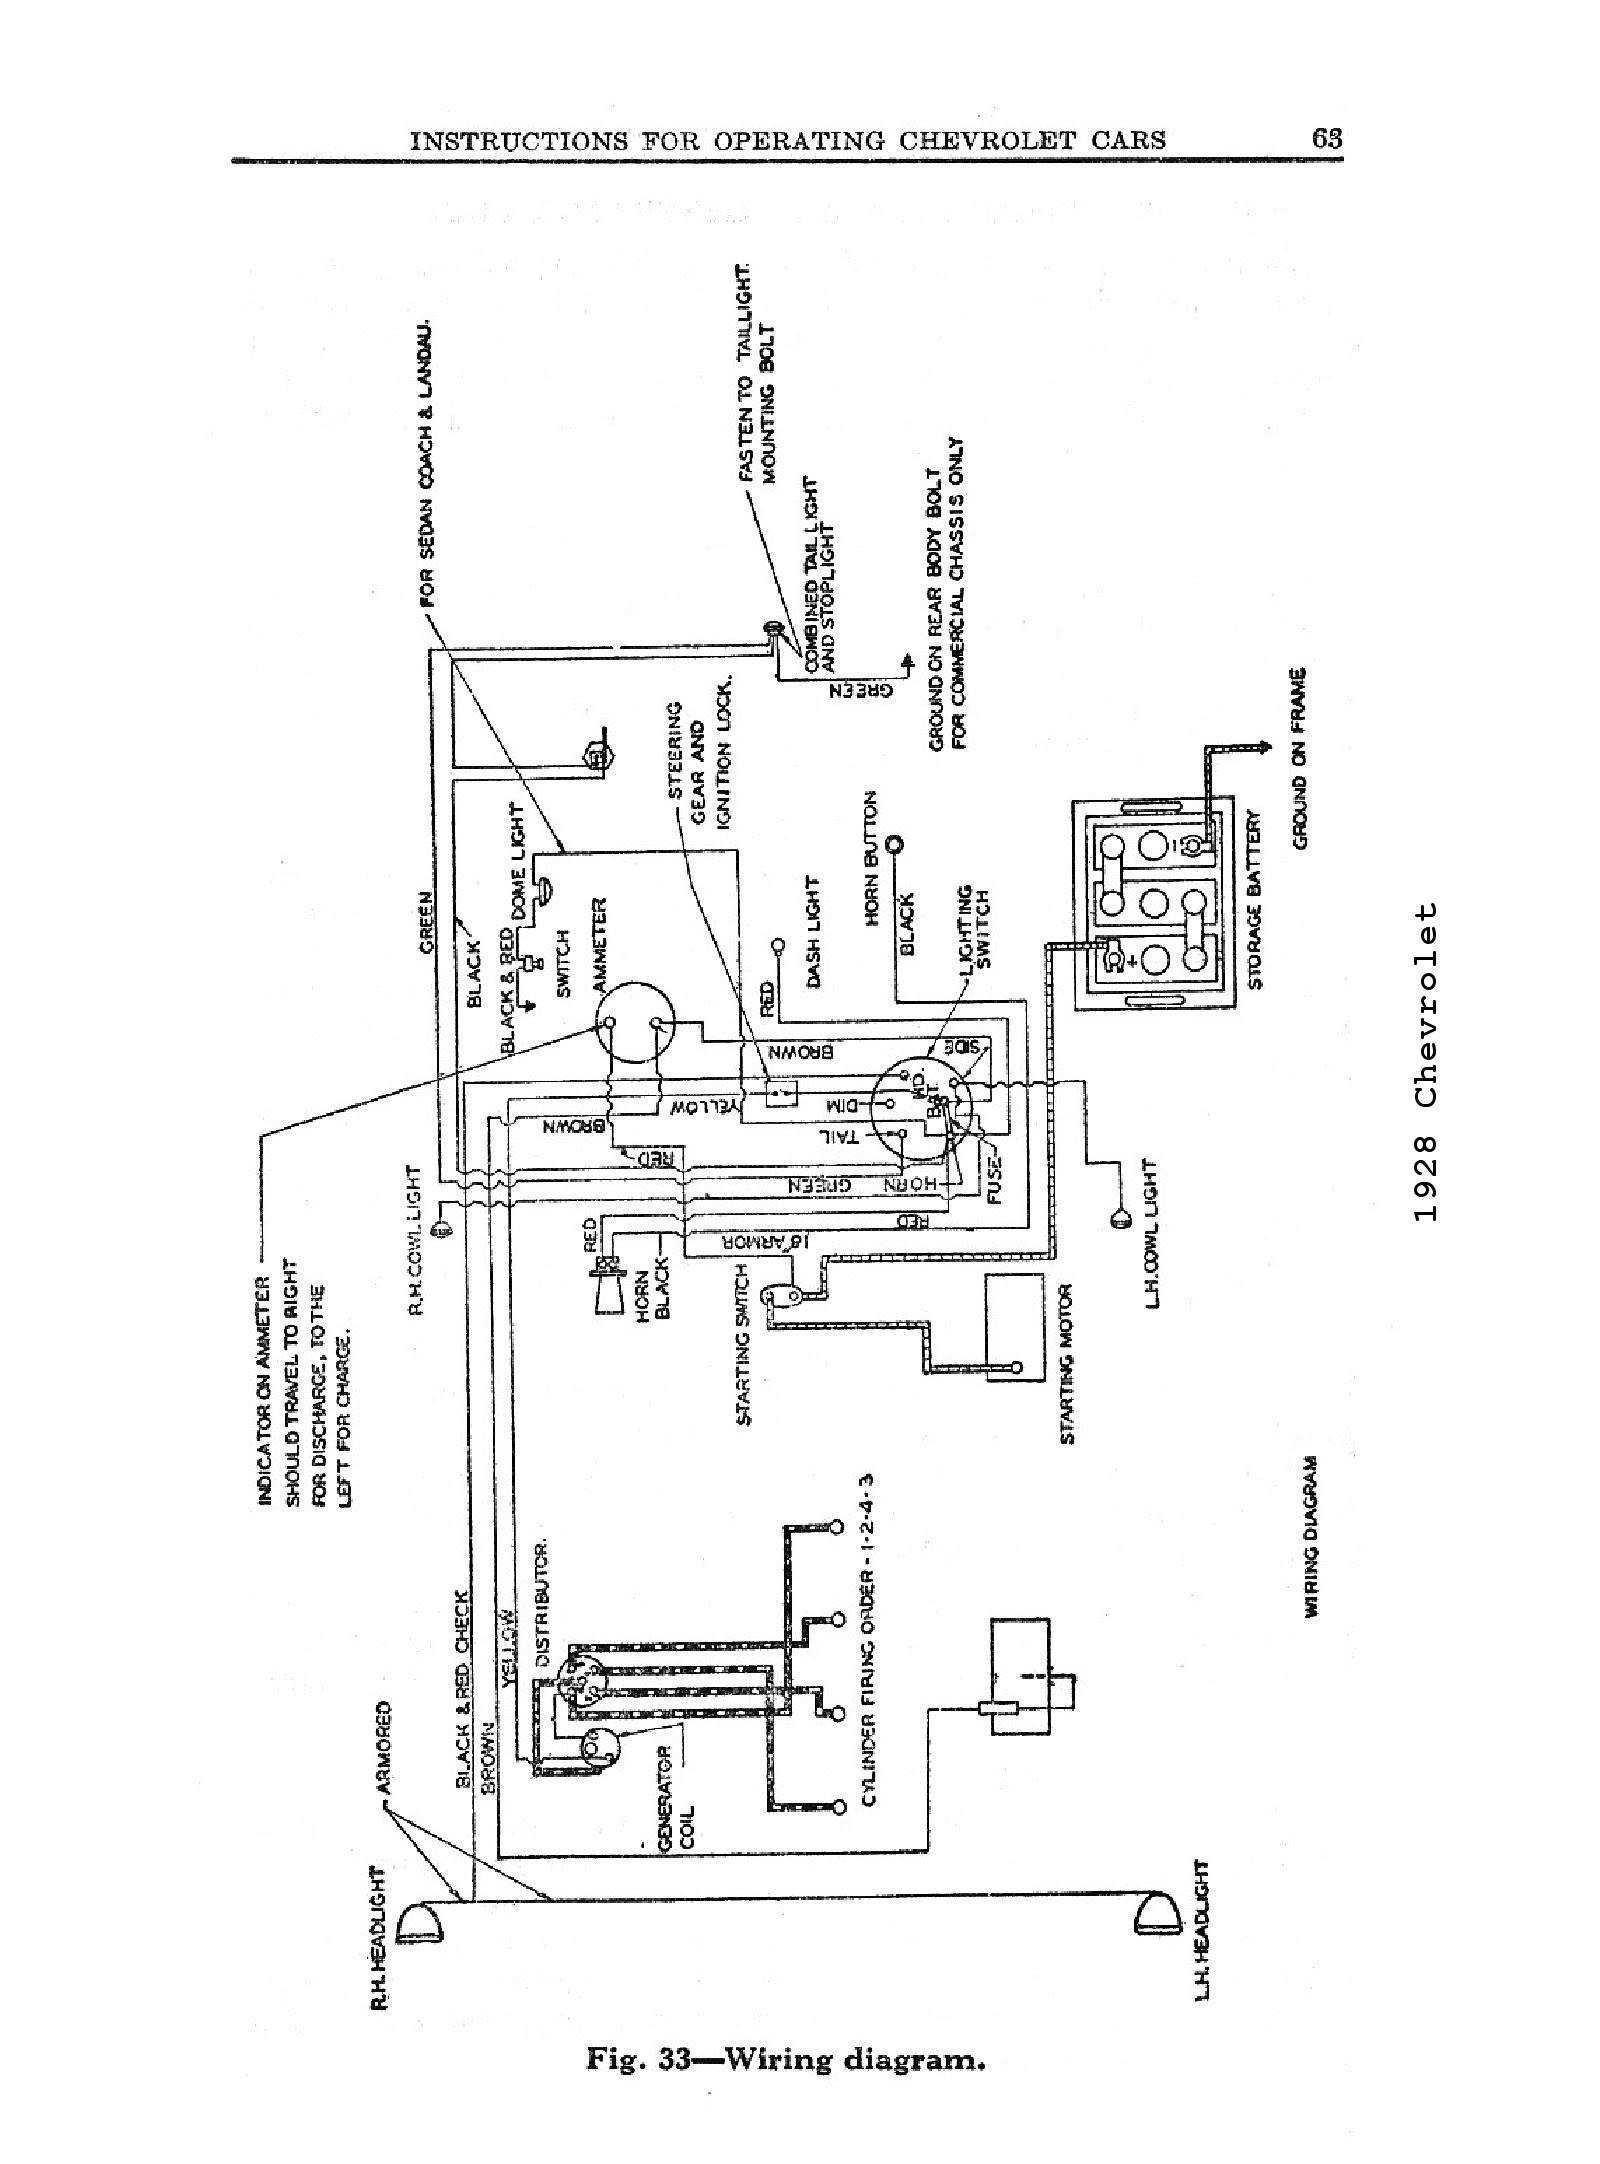 1962 Chevrolet Wiring Diagram